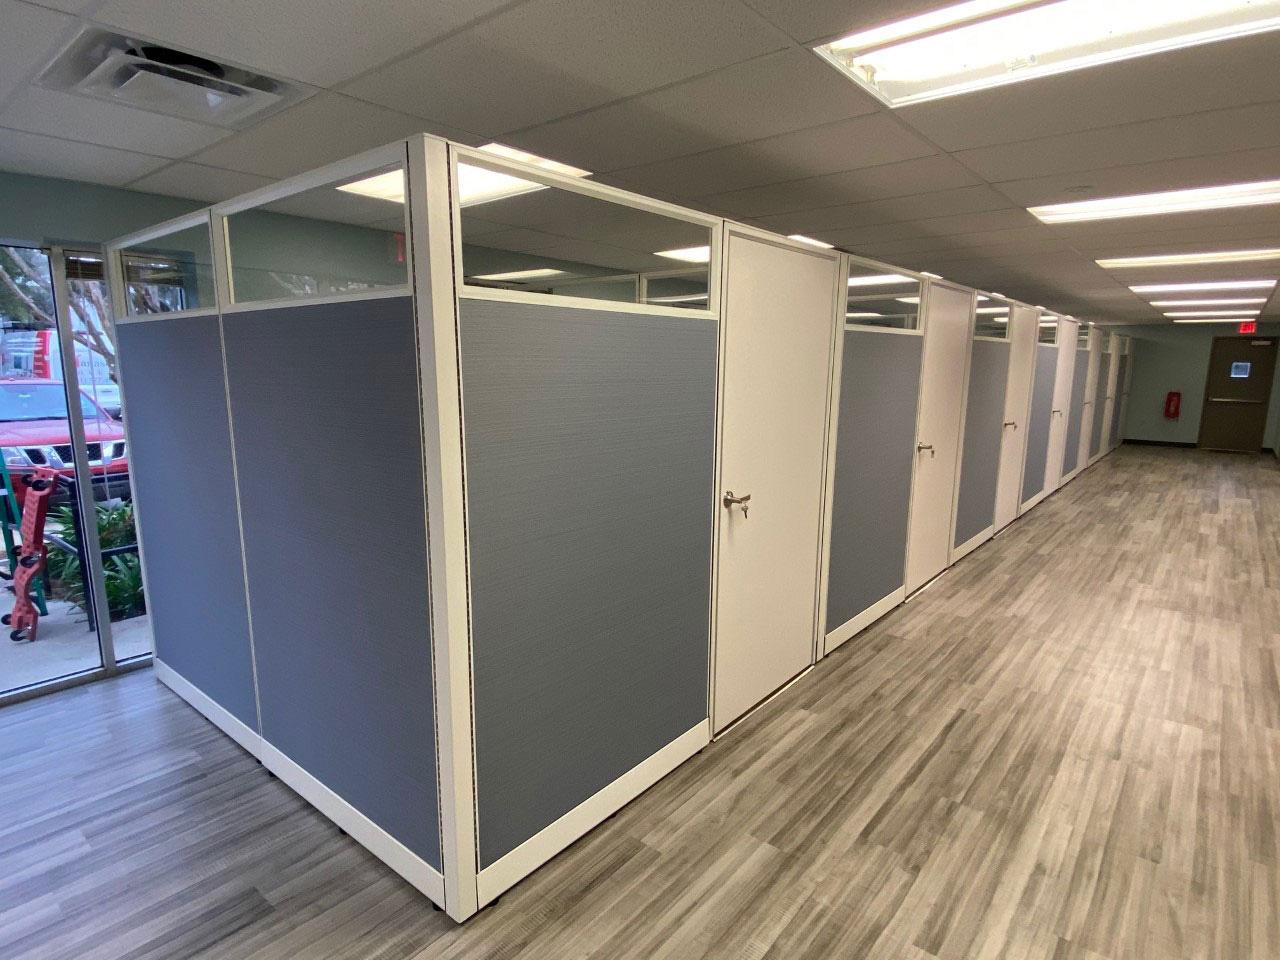 office-cubicle-furniture-suppliers-in-bradenton-florida-20.jpg